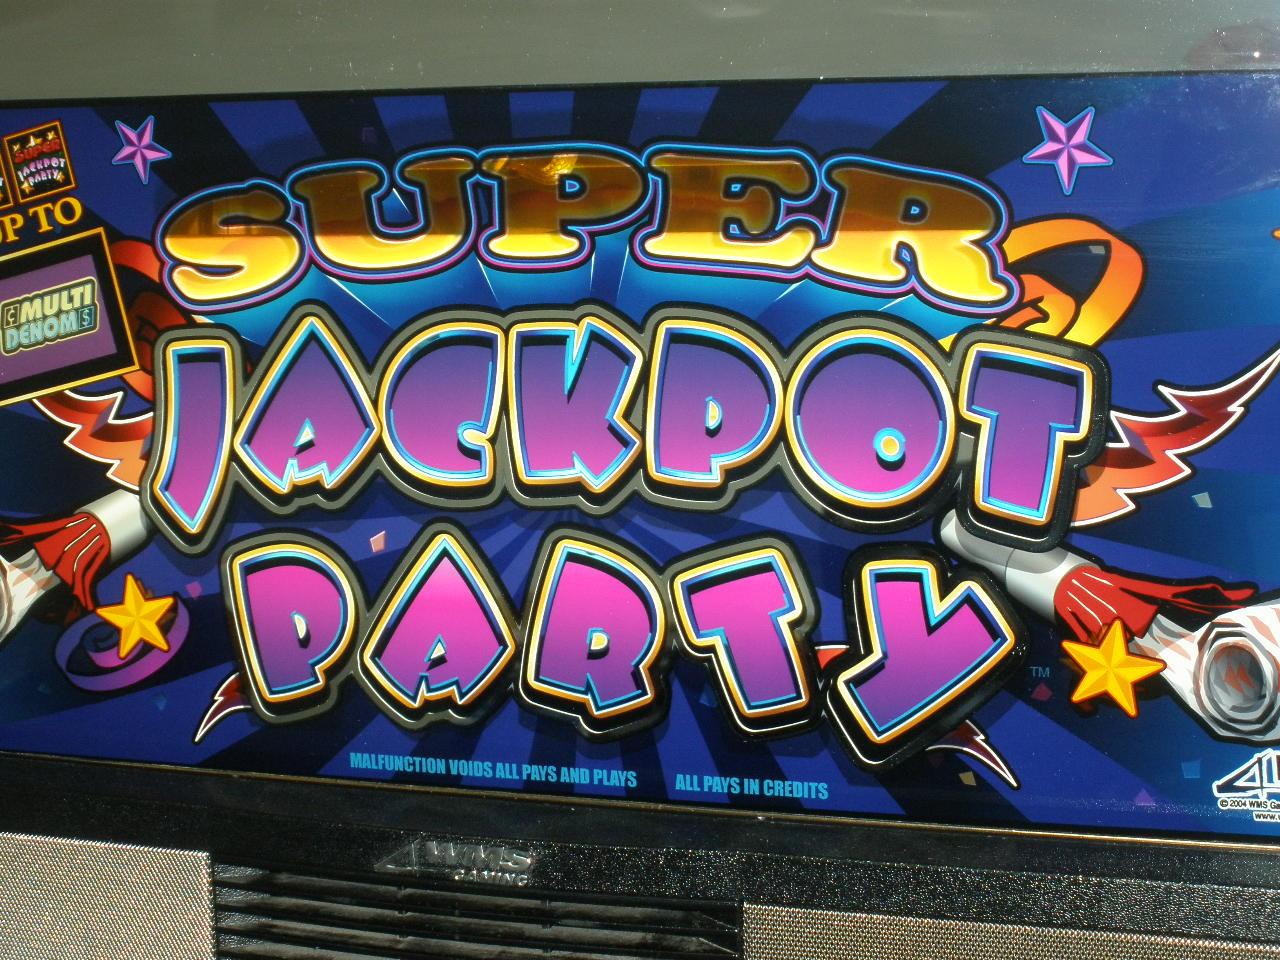 Wms Jackpot Party